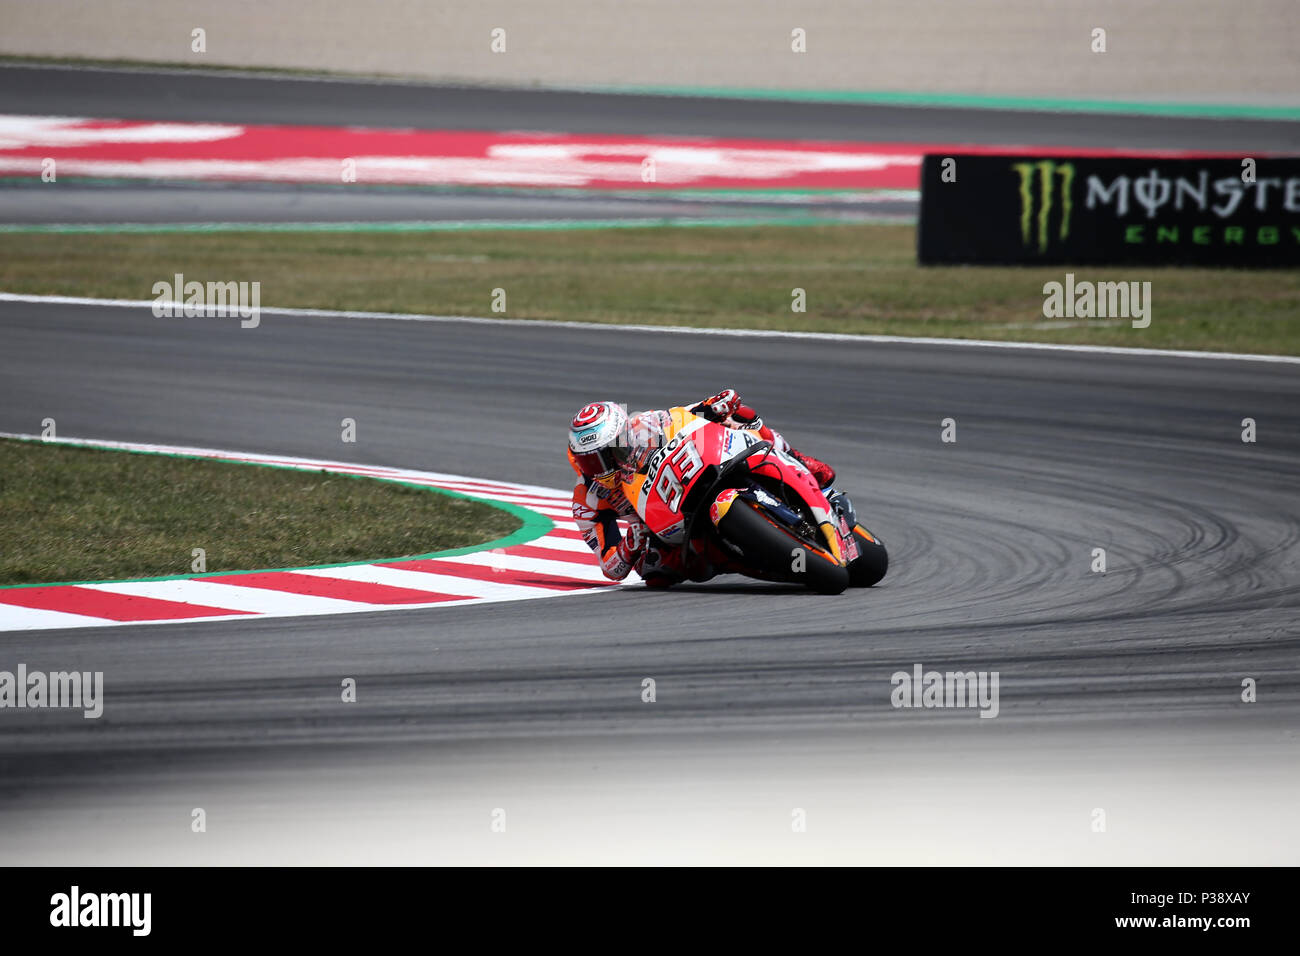 Barcelona -17th June 2018- SPAIN: Marc Marquez (Honda) during the  the GP Catalunya Moto GP, in the Barcelona-Catalunya Circuit, on 17th June 2018. Photo: Joan Valls/Urbanandsport/Cordon Press - Stock Image